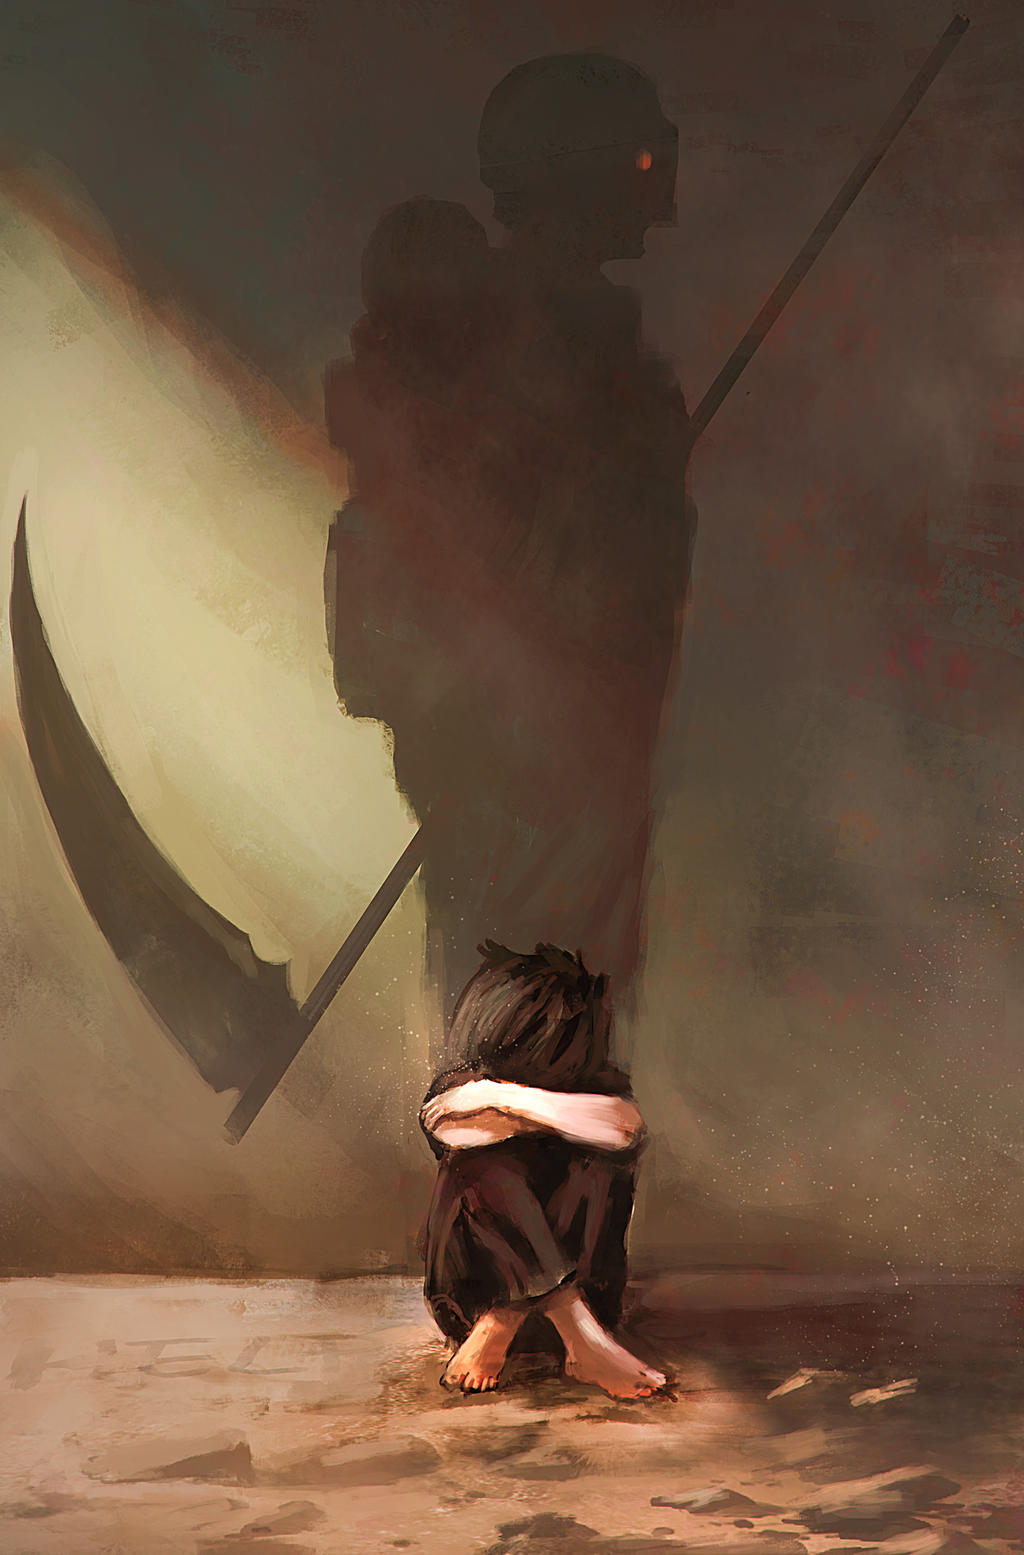 Creating War by Fenris31